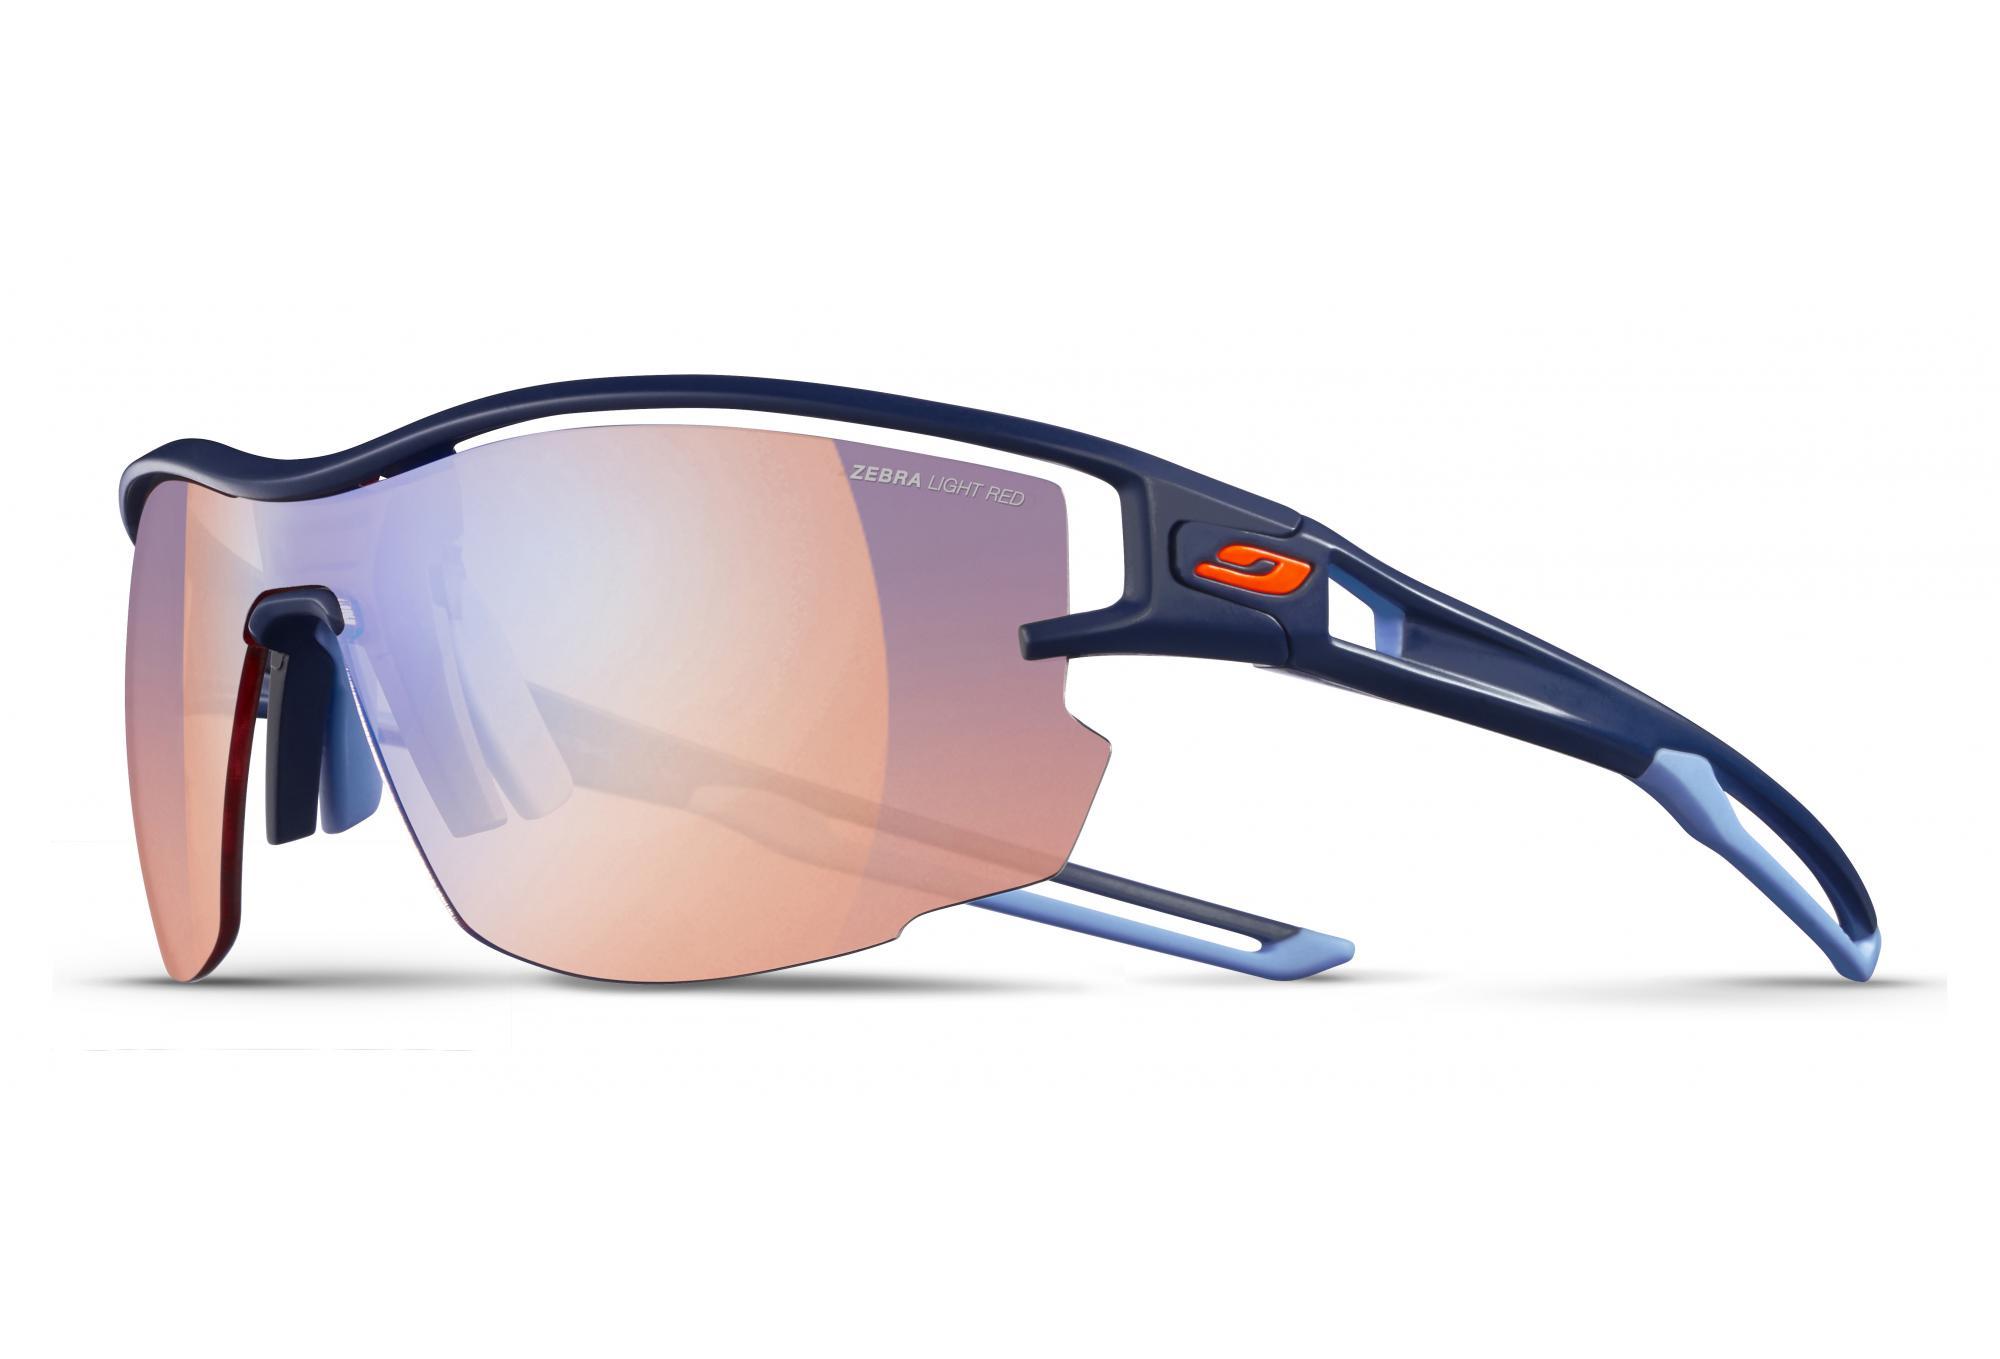 4ffbc2ebca Julbo Aero Zebra Light glasses Blue - Red